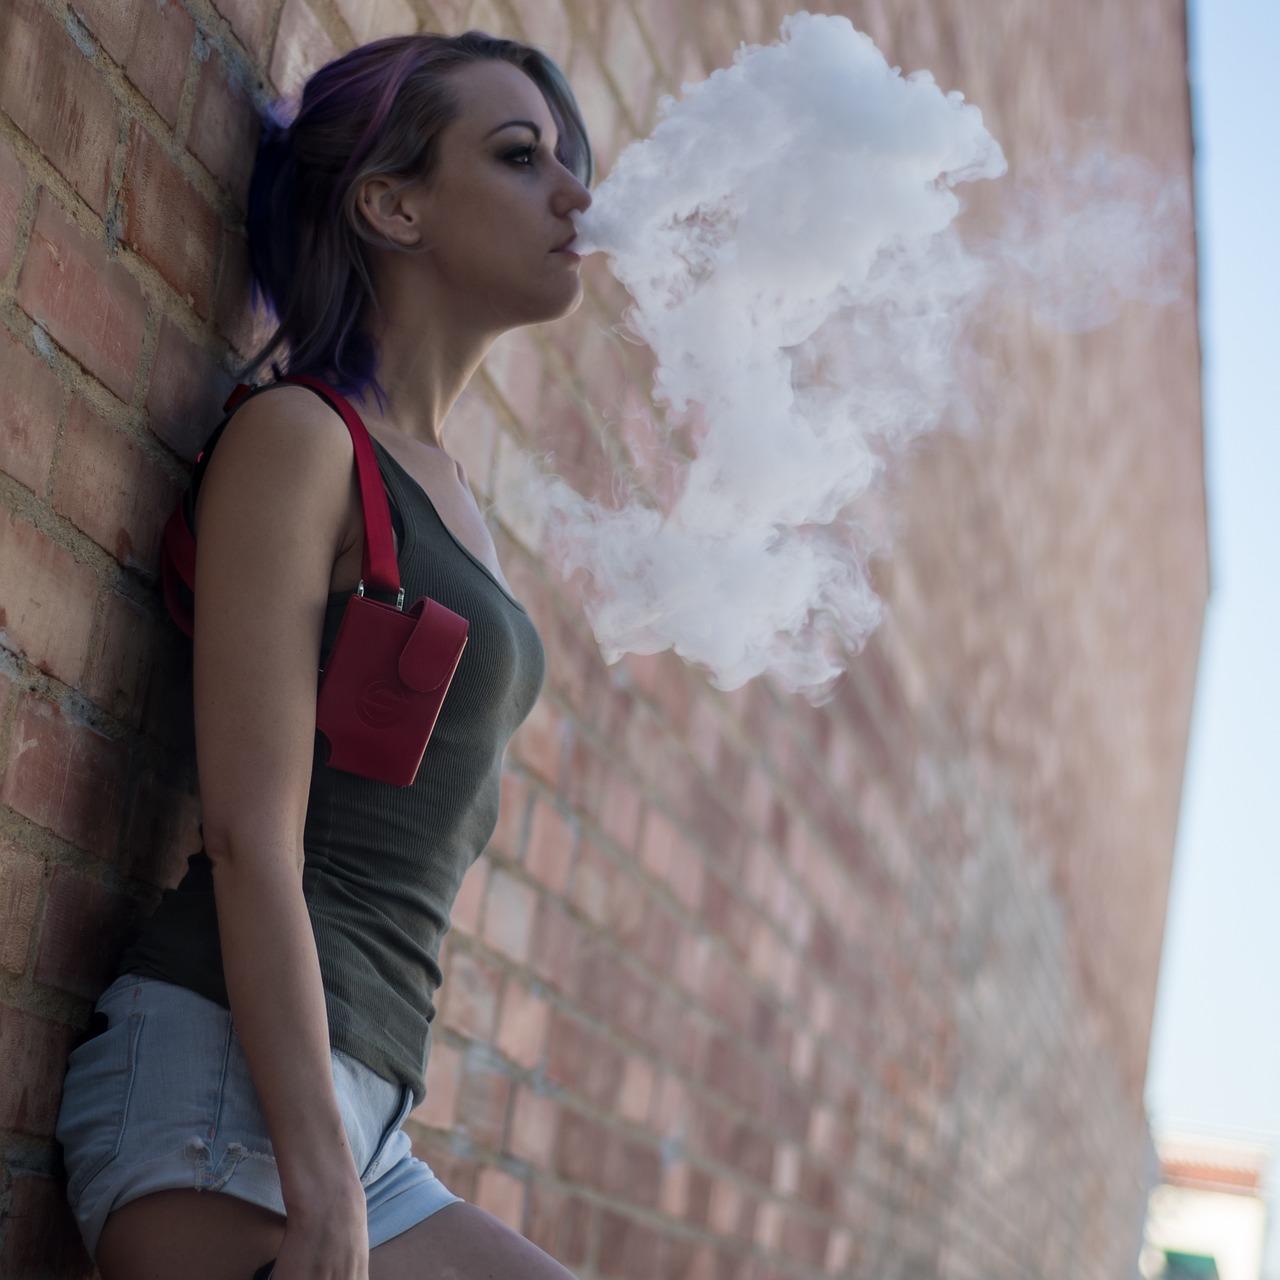 women smoke vape